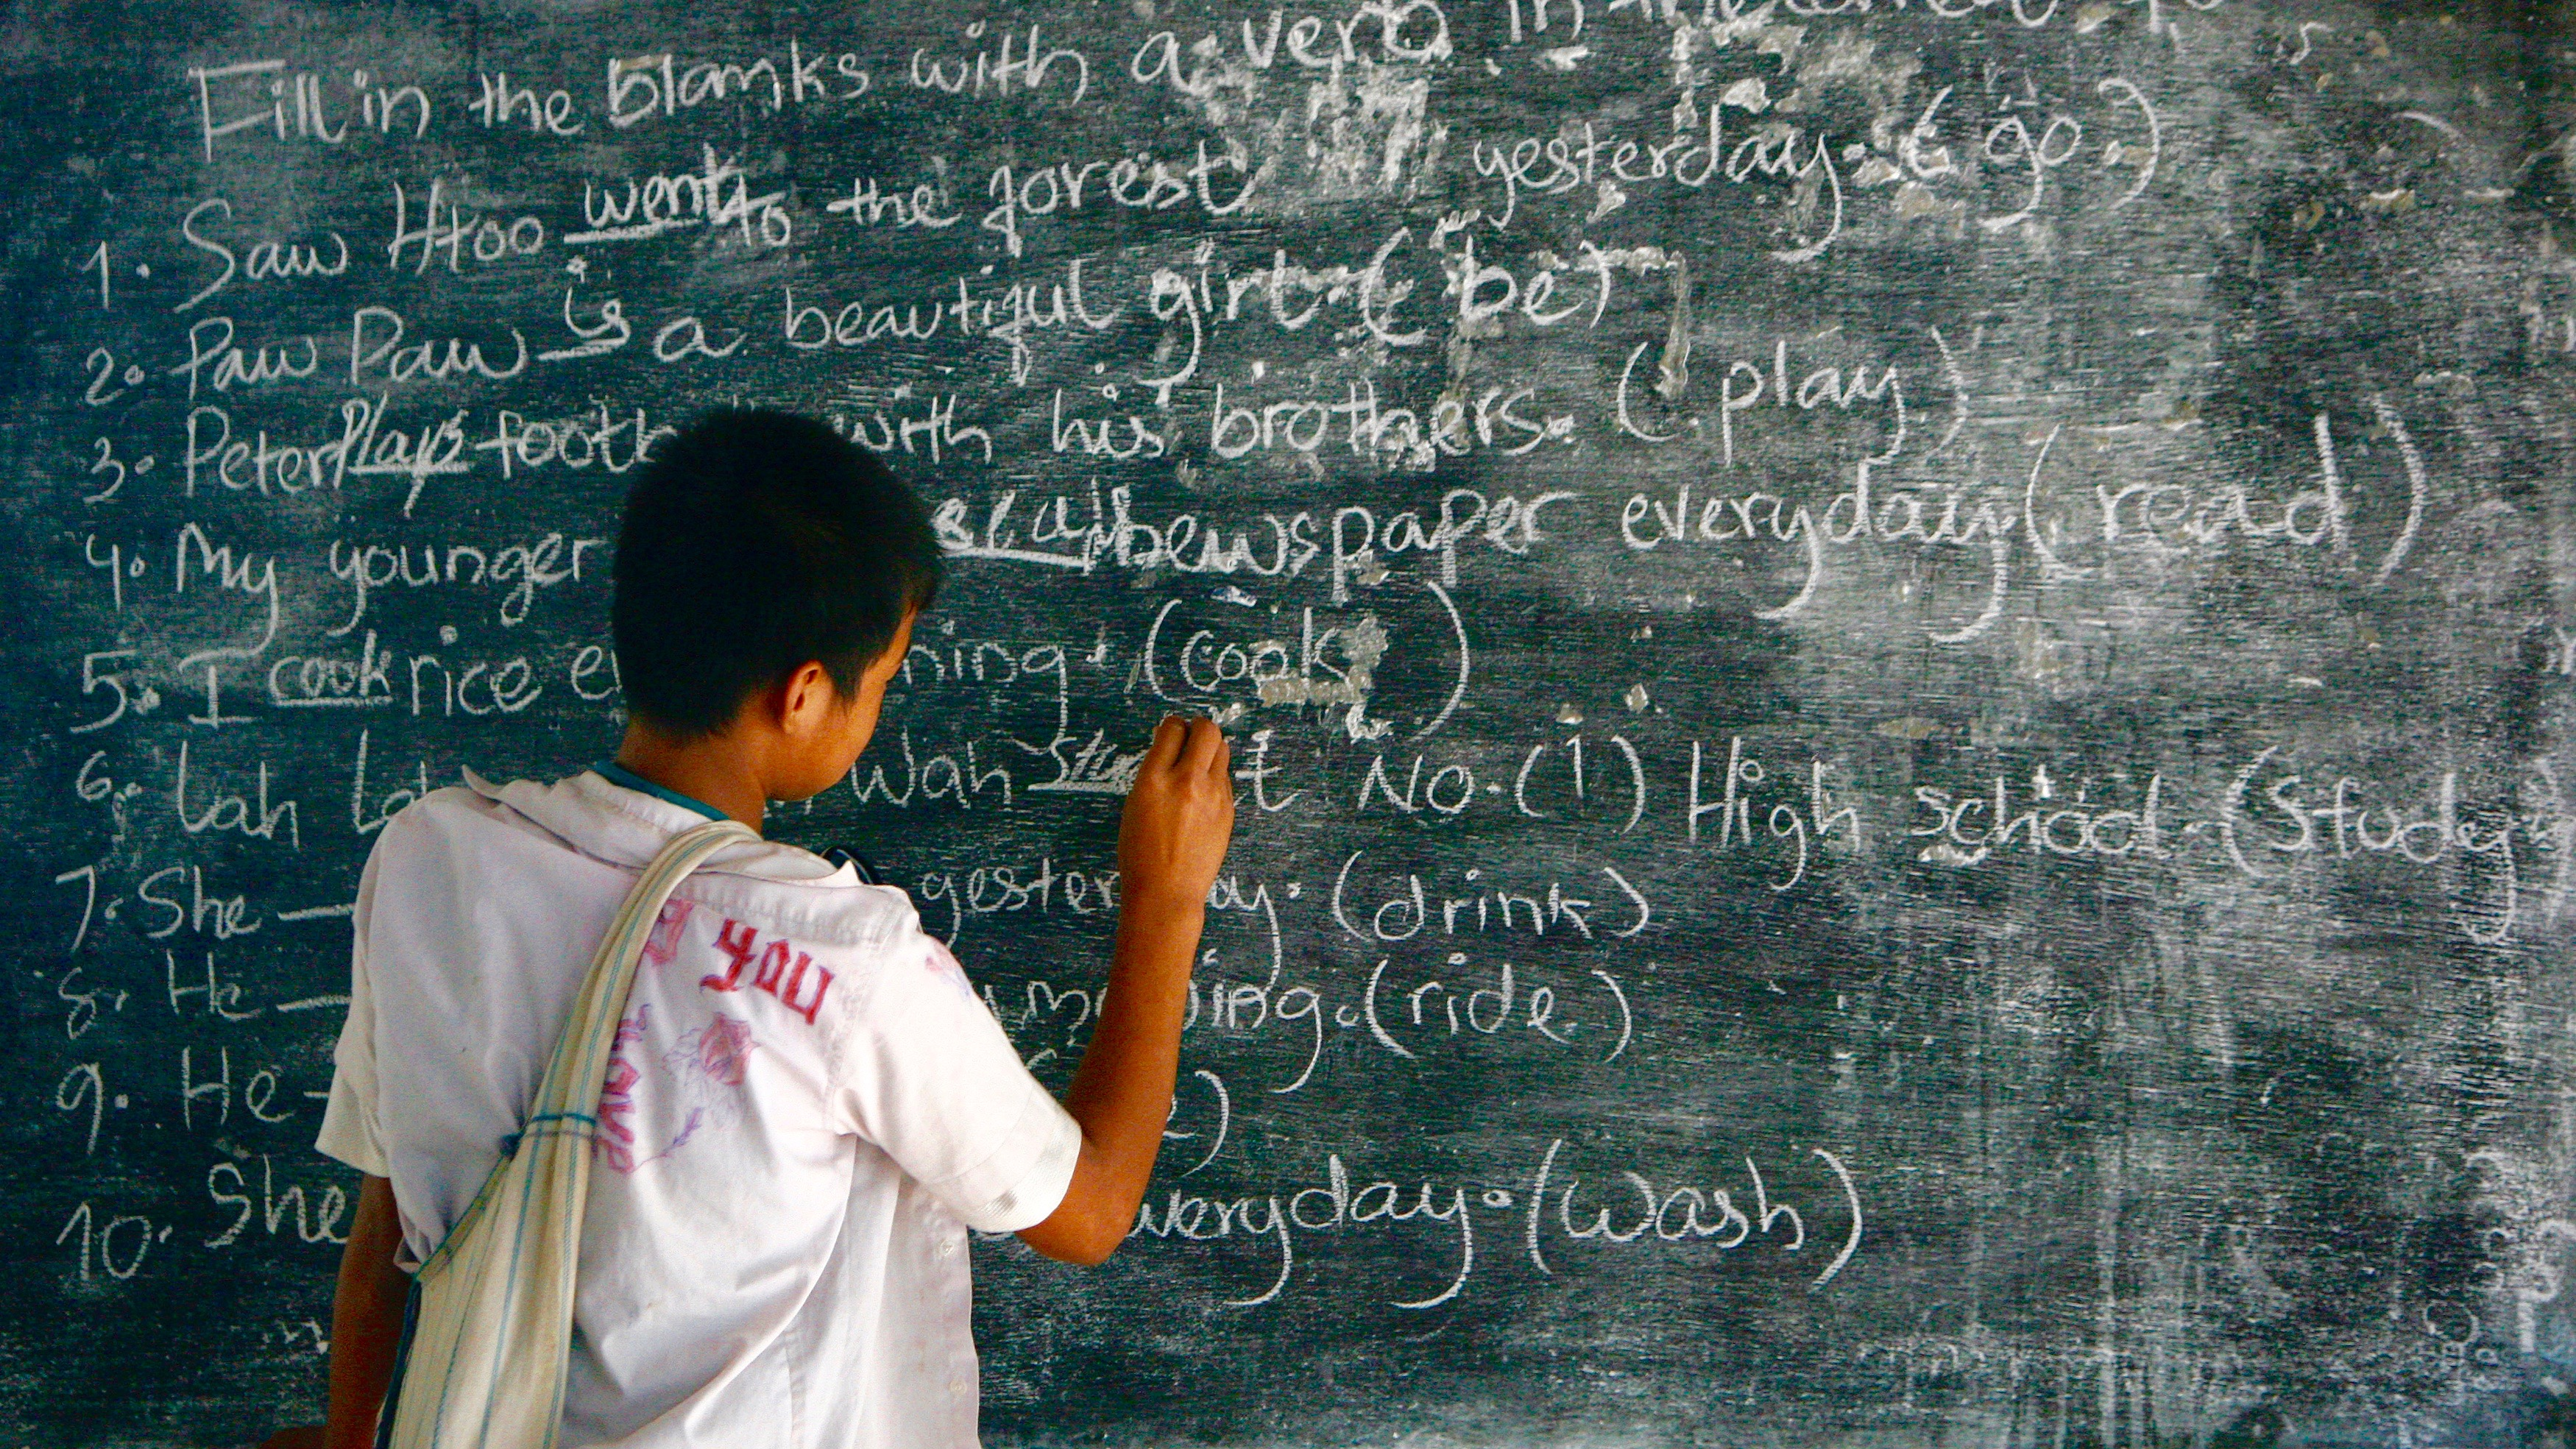 Boy at chalkboard writing in English (Thailand).